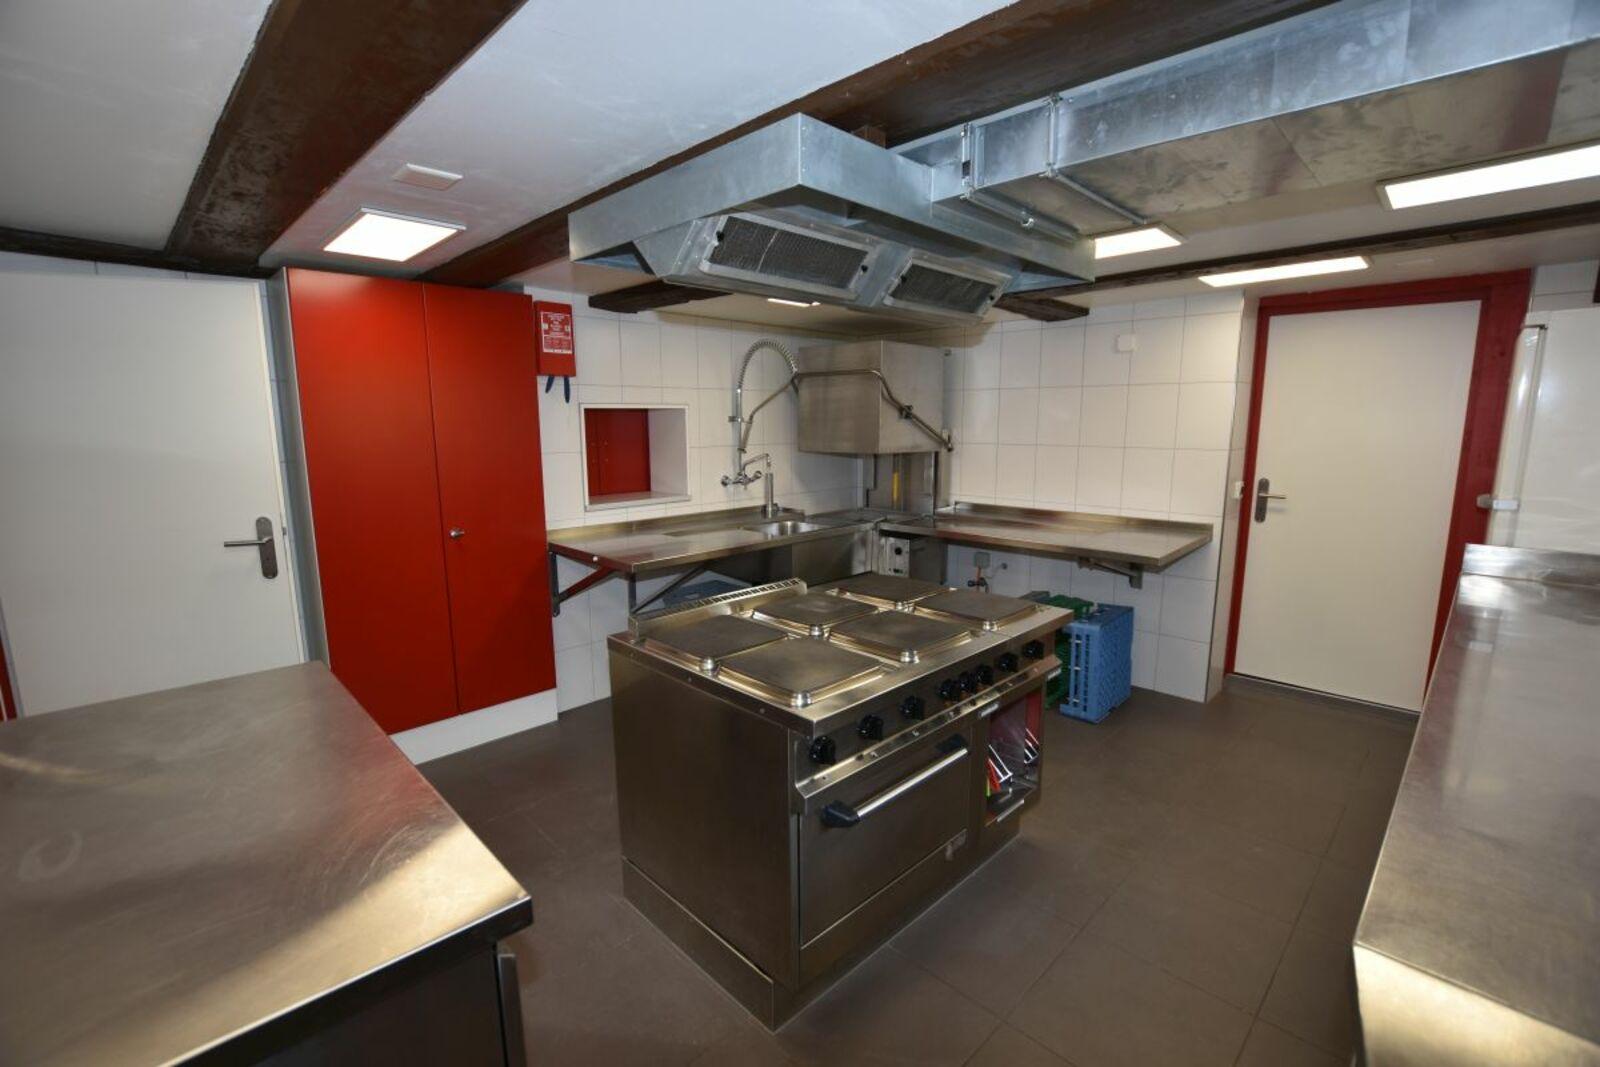 Pfadiheim Wangen, 4612 Wangen bei Olten - 9521 - Küche